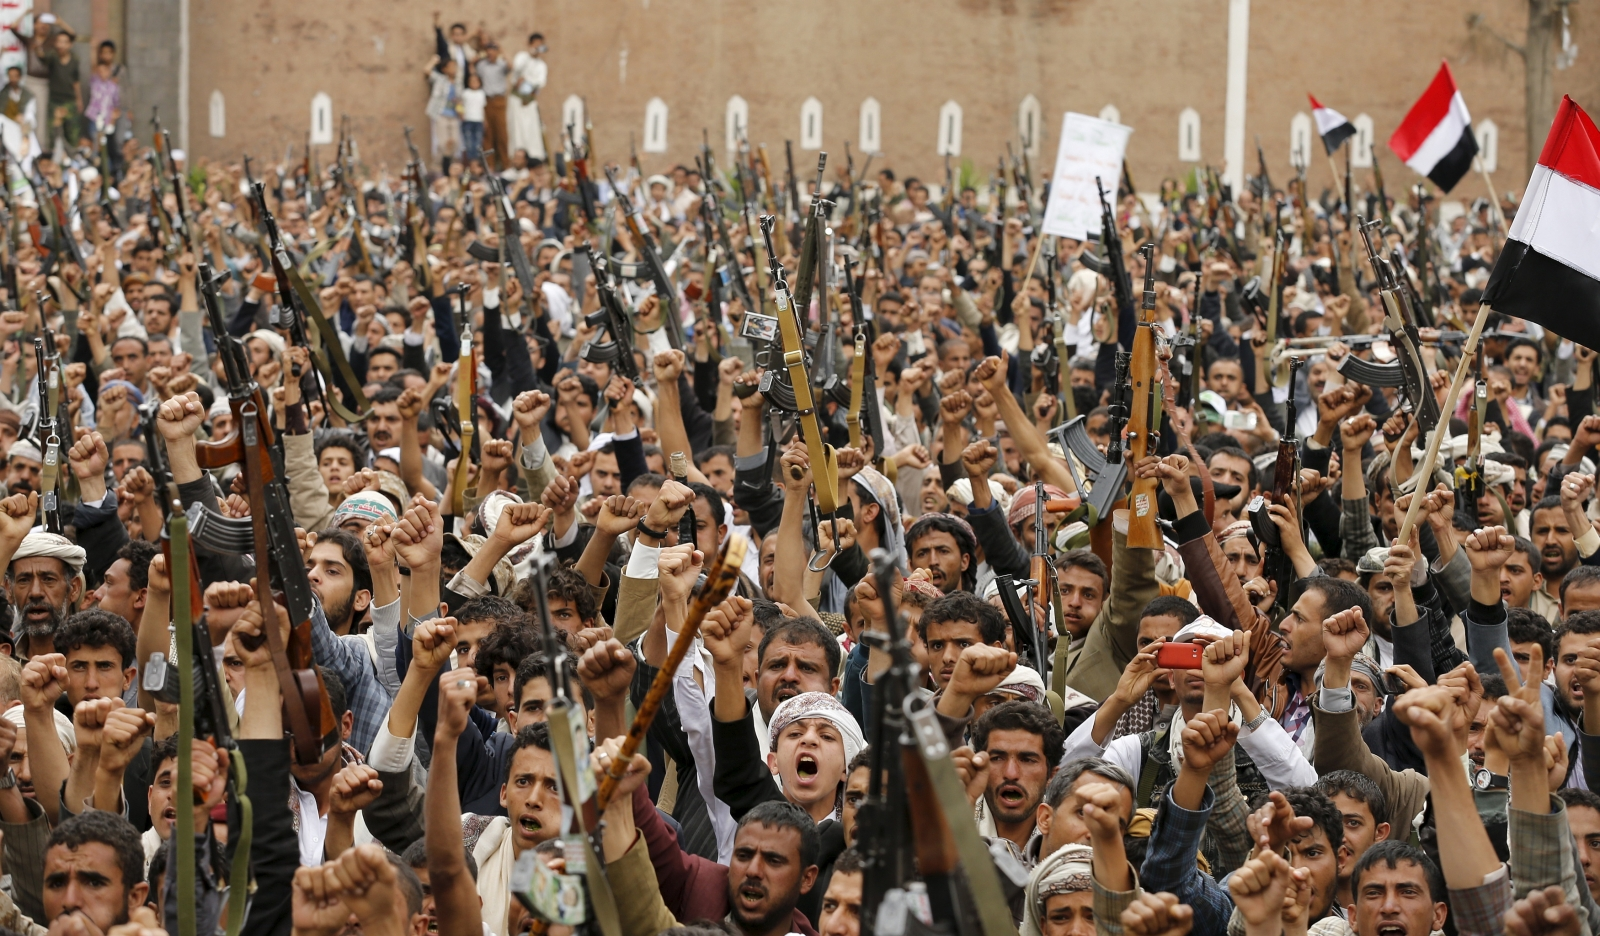 Yemen crisis: Rebel leader Abdulmalik al-Houthi promises to create 'graveyard' of Sunni invaders